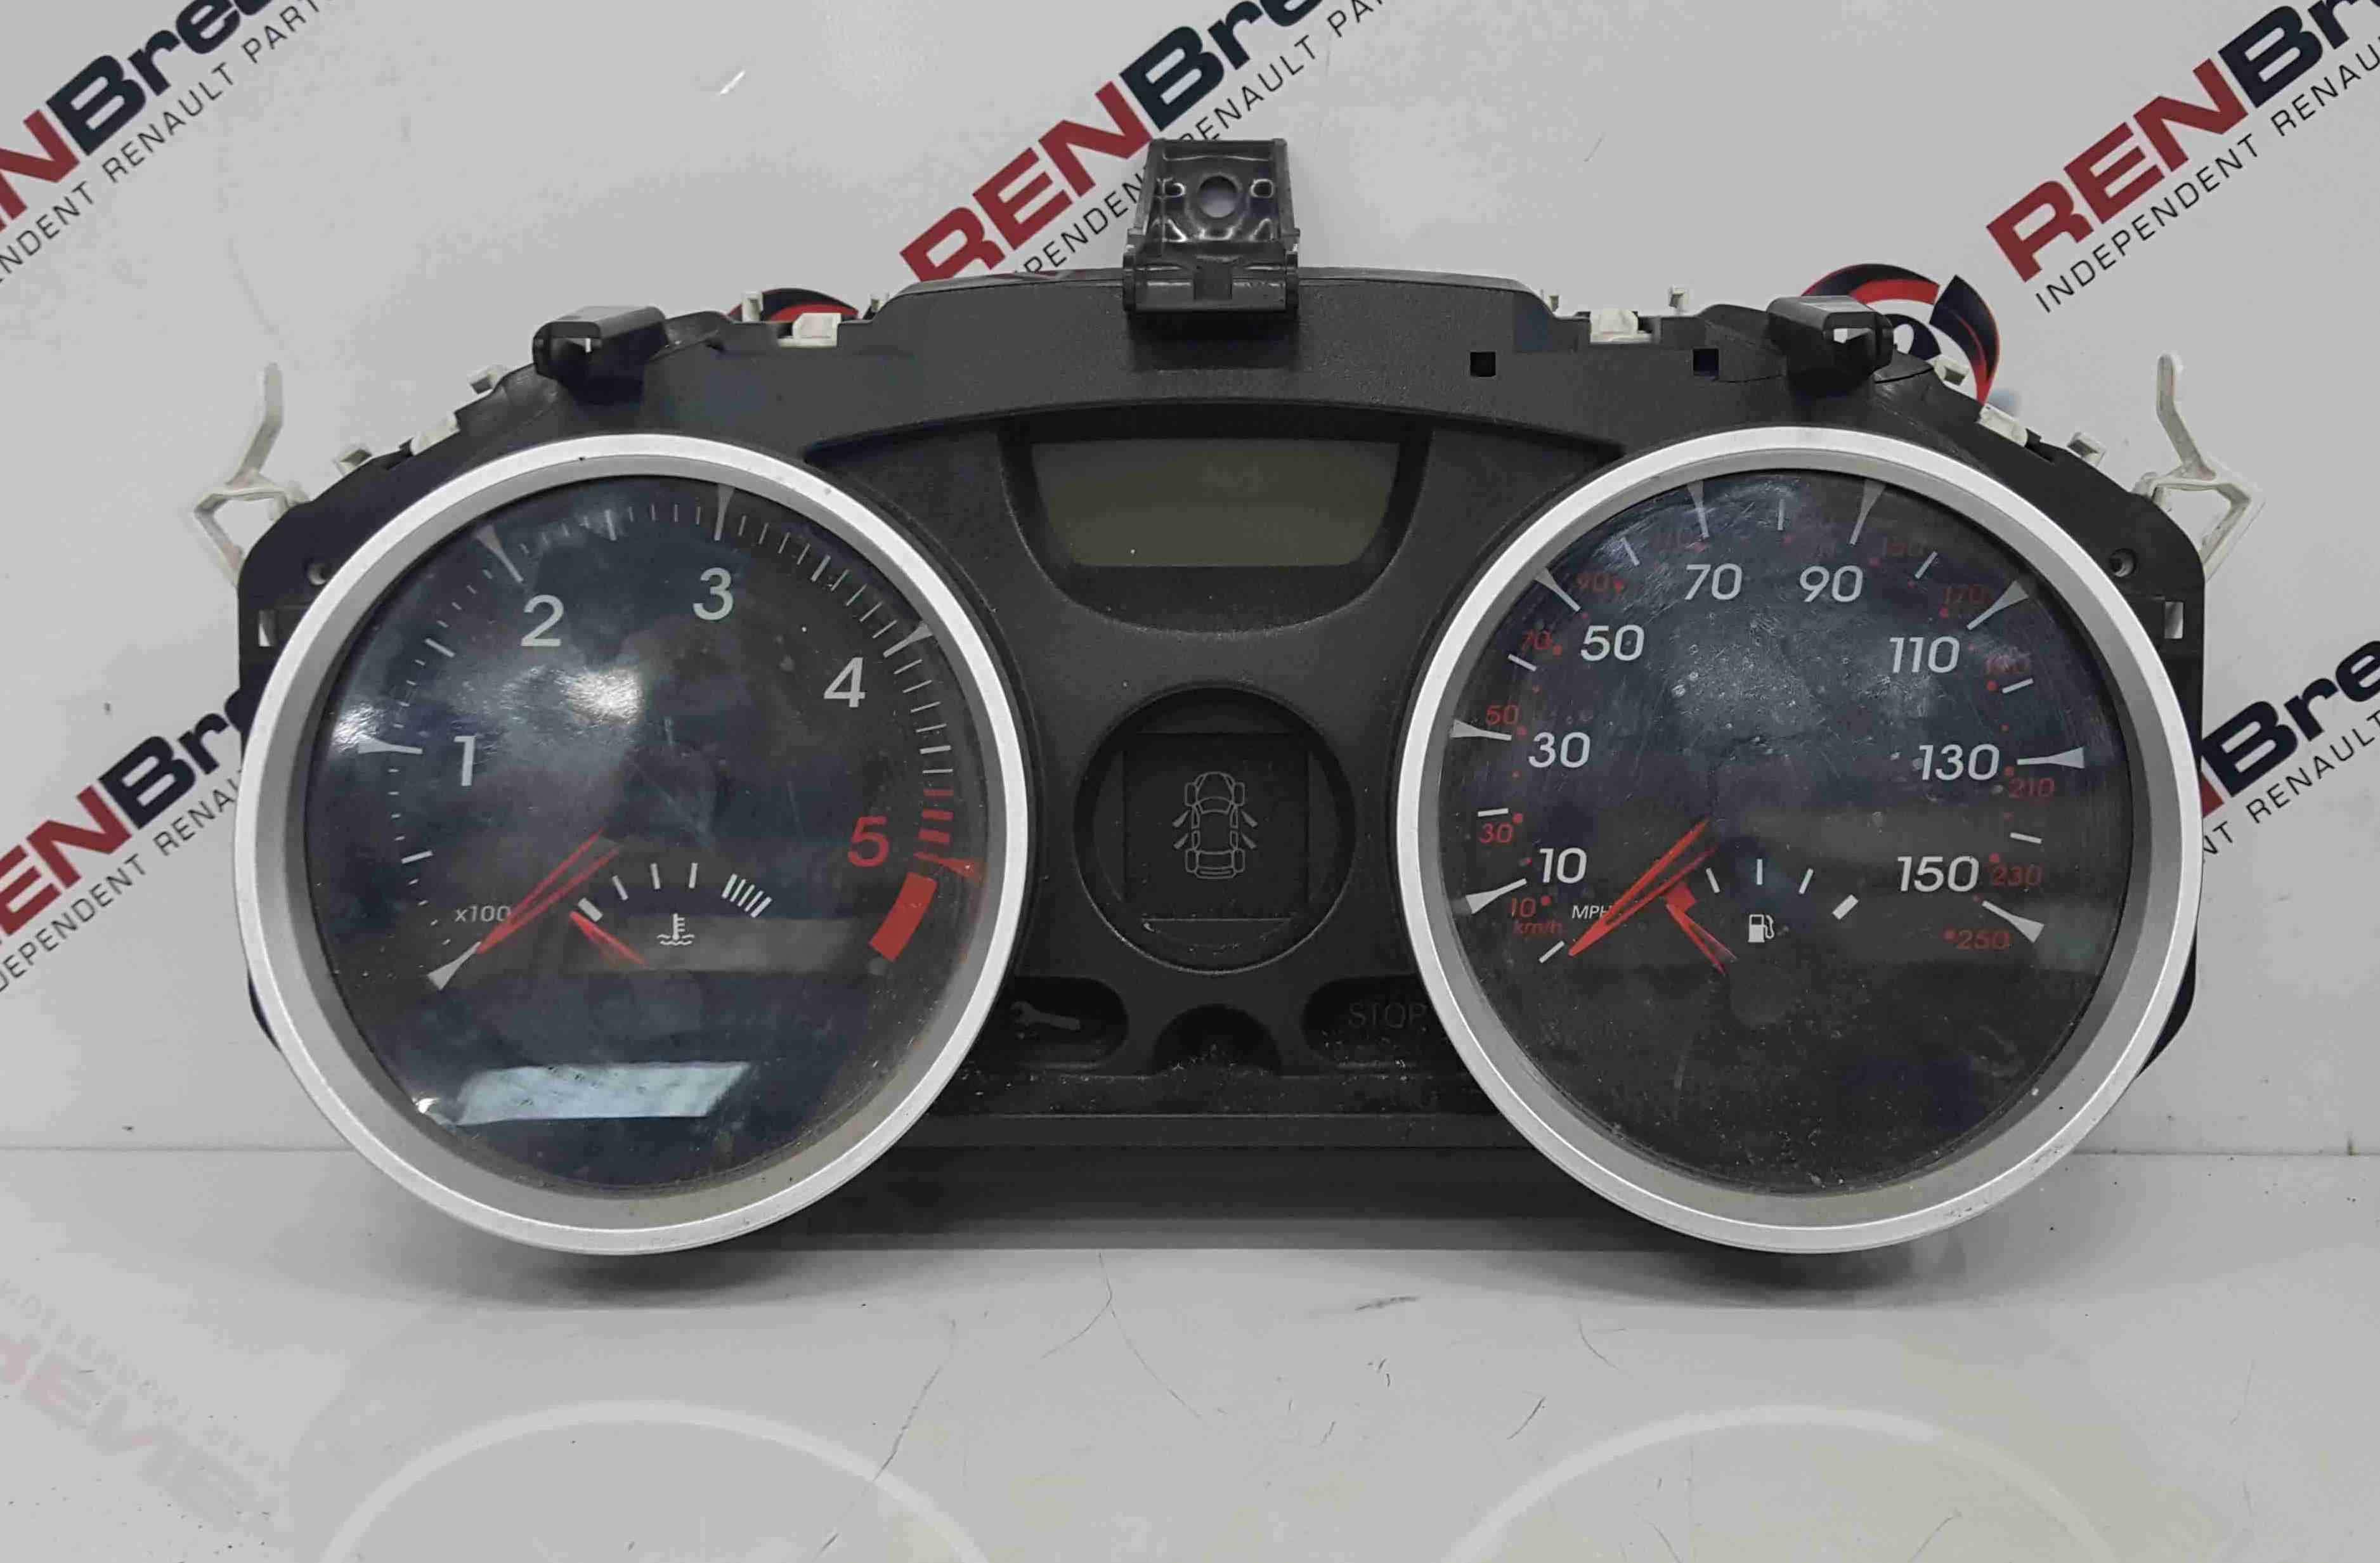 Renault Megane MK2 2006-2008 Instrument Panel Dials Clocks 8200602370